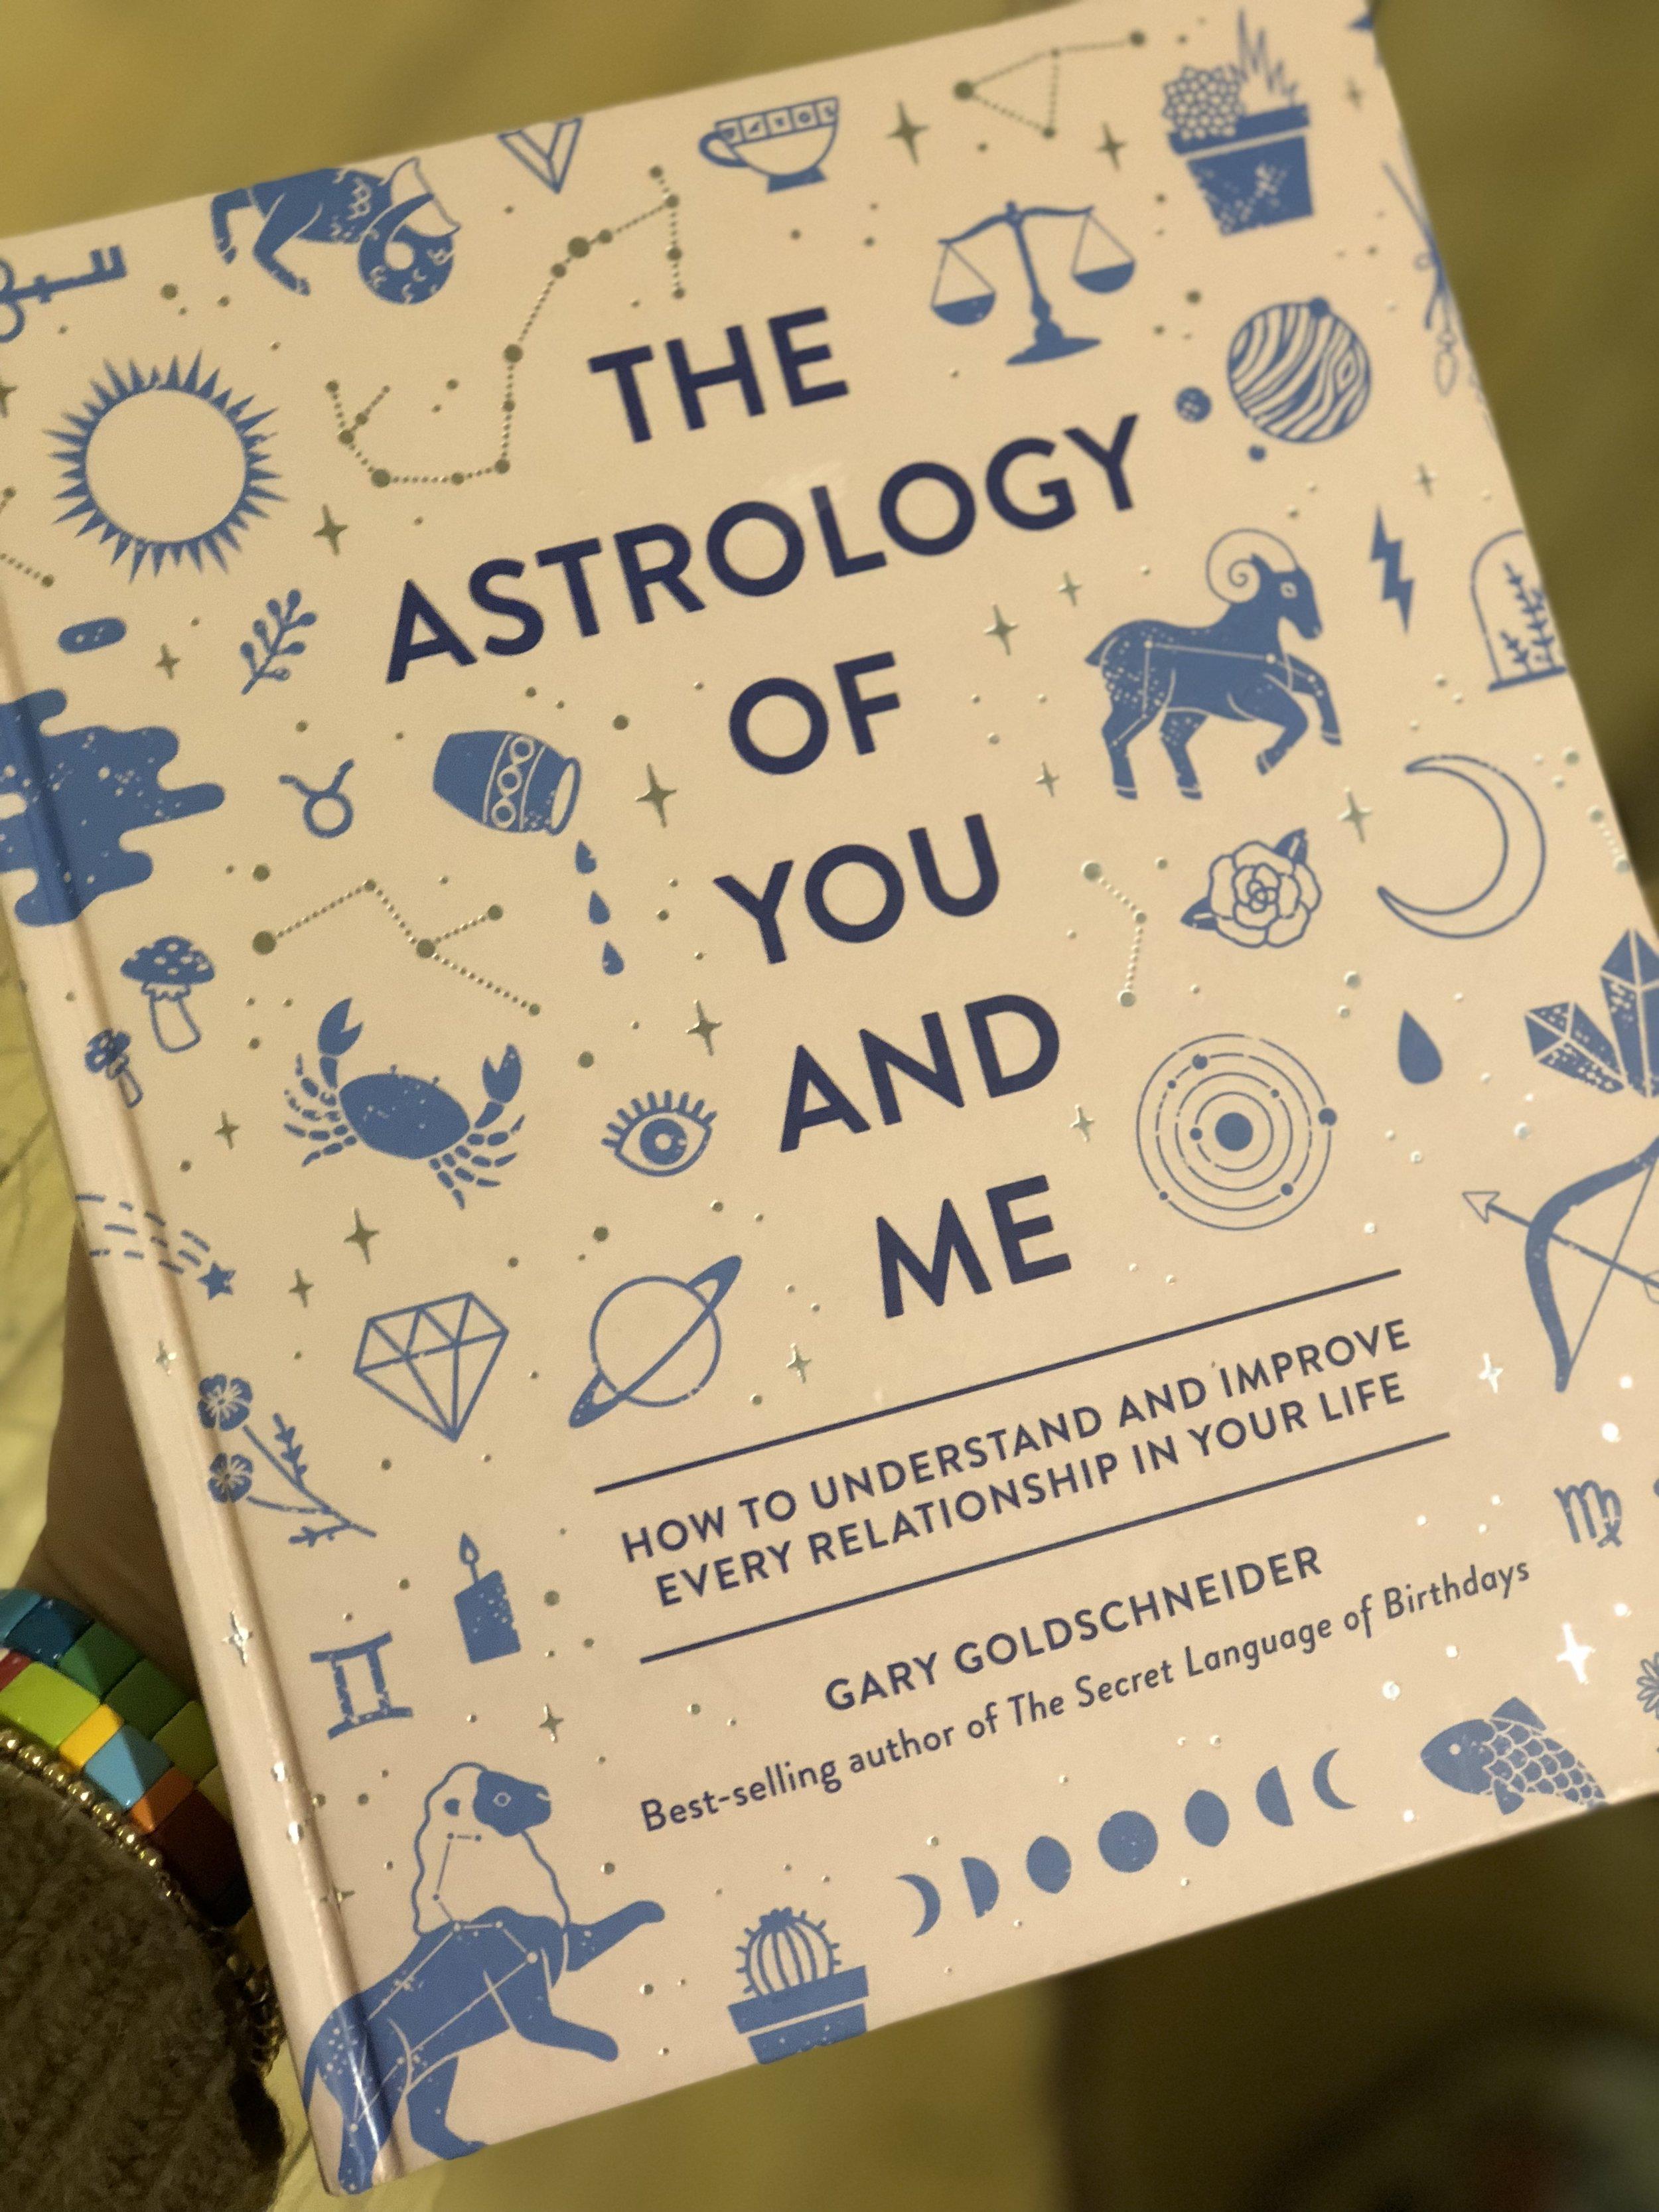 Atsrology book anthropologie lolla - 5 Things